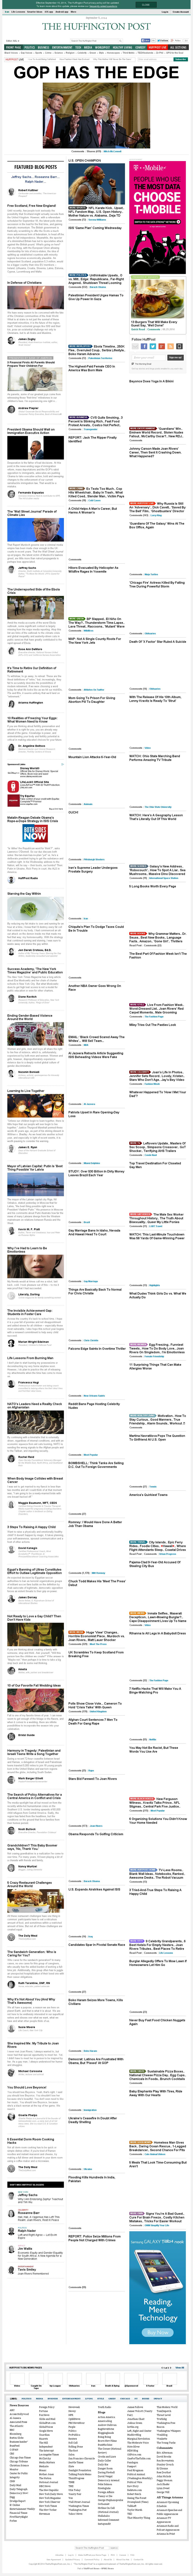 The Huffington Post at Monday Sept. 8, 2014, 7:07 a.m. UTC